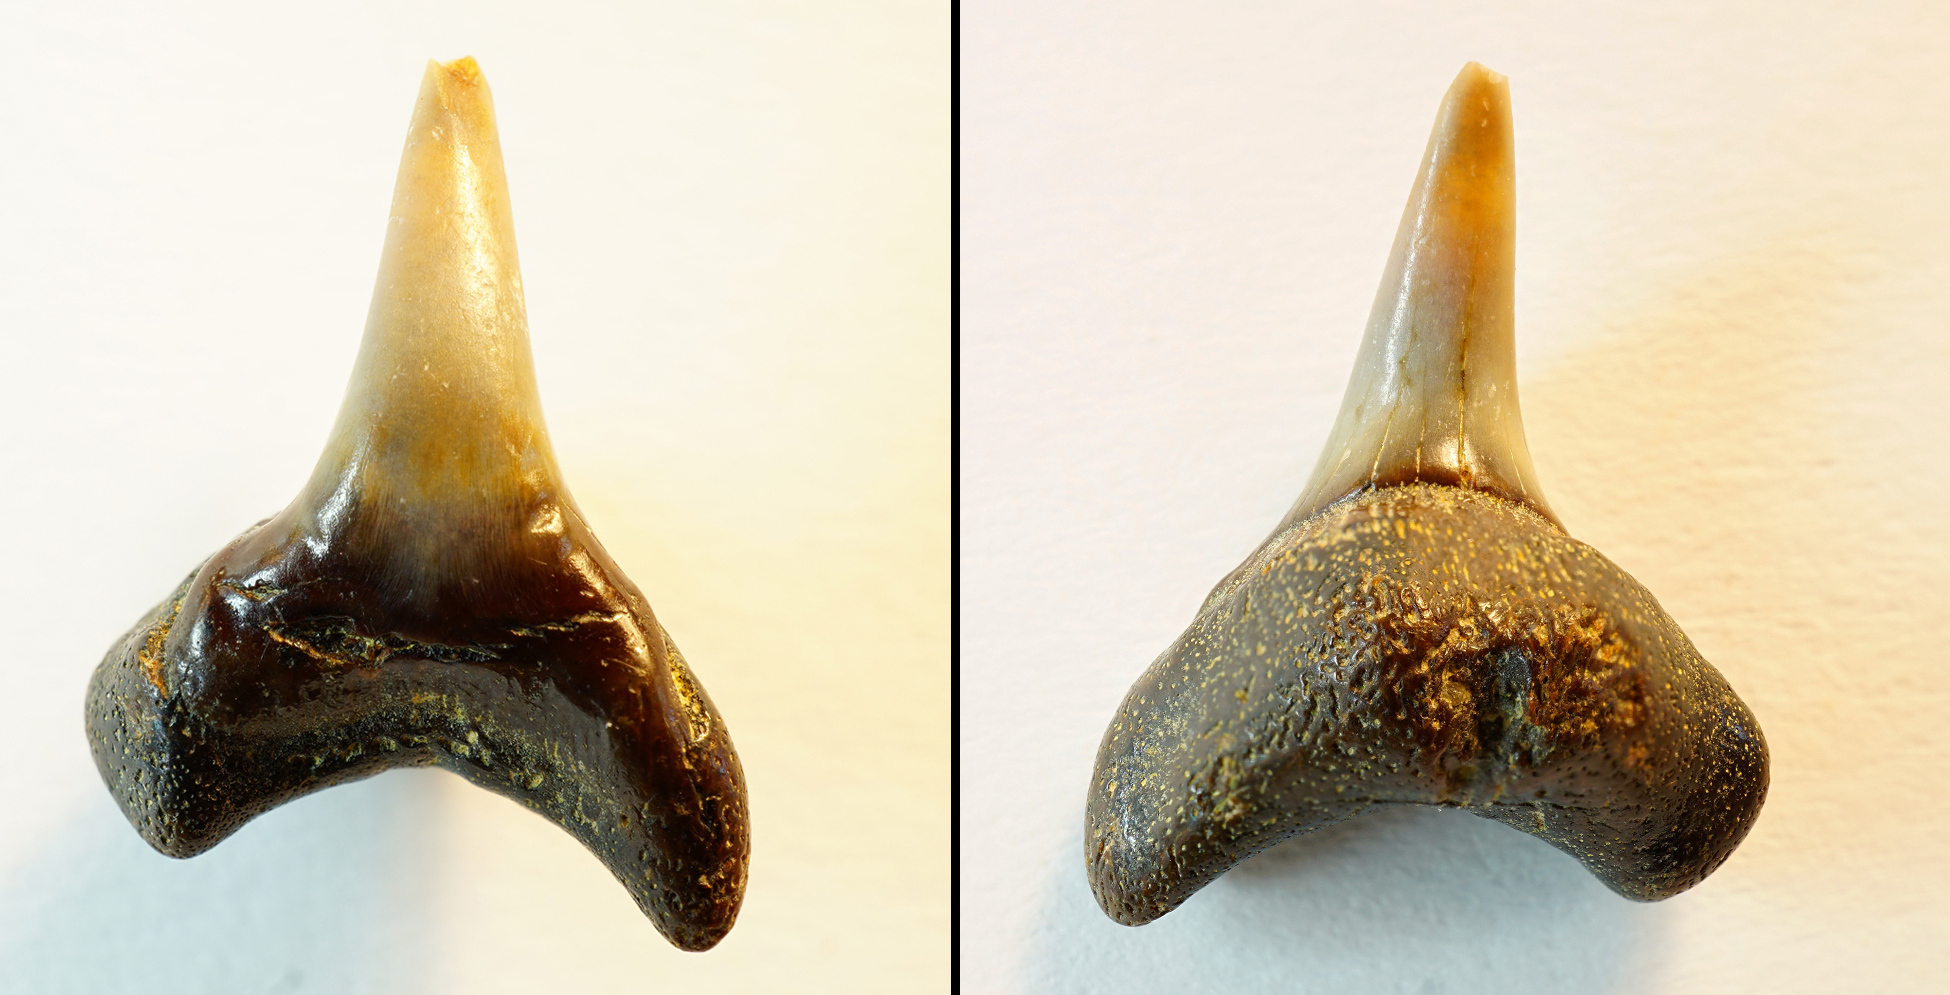 Alopias exigua, anteriorer Zahn, Höch nähe Passau, Bayern, NHMW1990/1487/0189